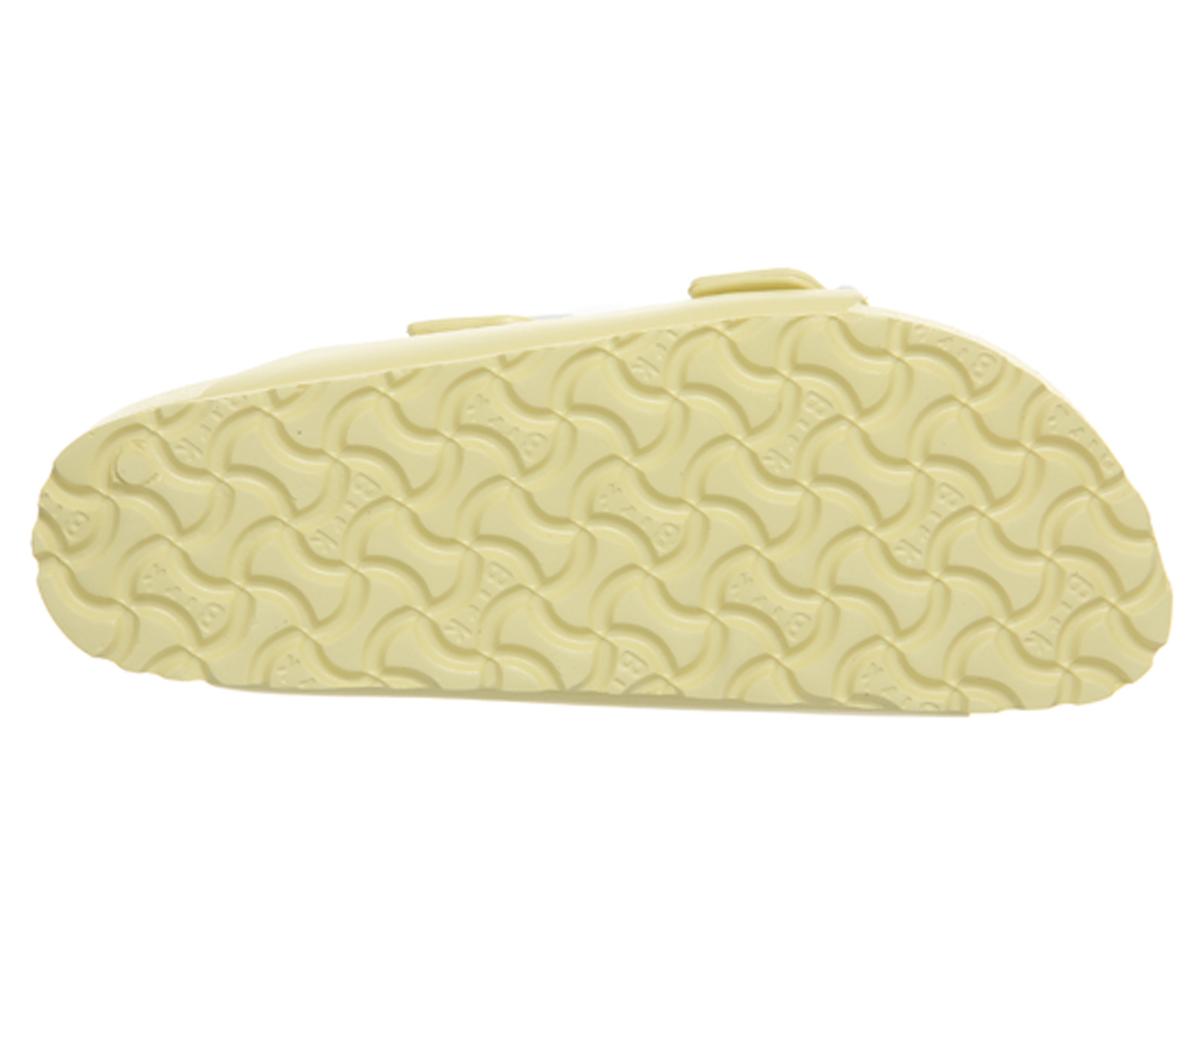 SENTINEL Womens Birkenstock Arizona due sandali con cinturino morbido  giallo Sandali EVA 33d40145780